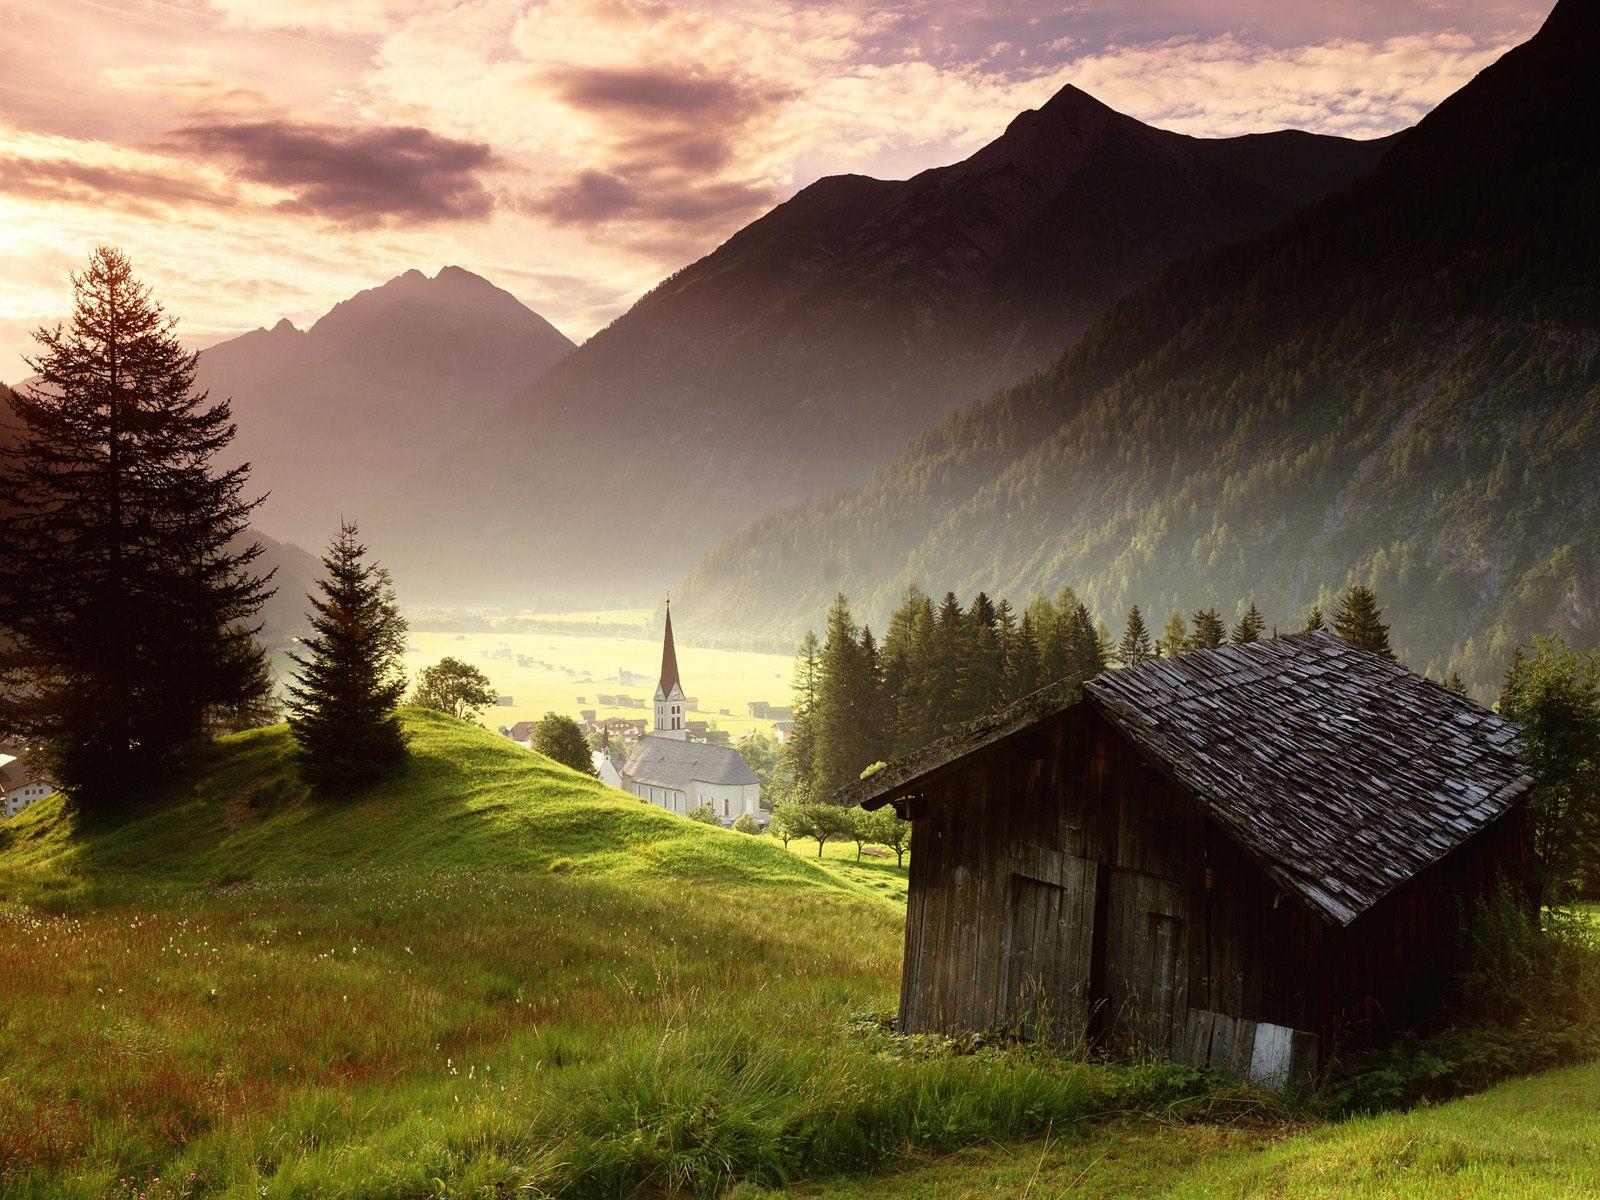 018 Tyrol Austria